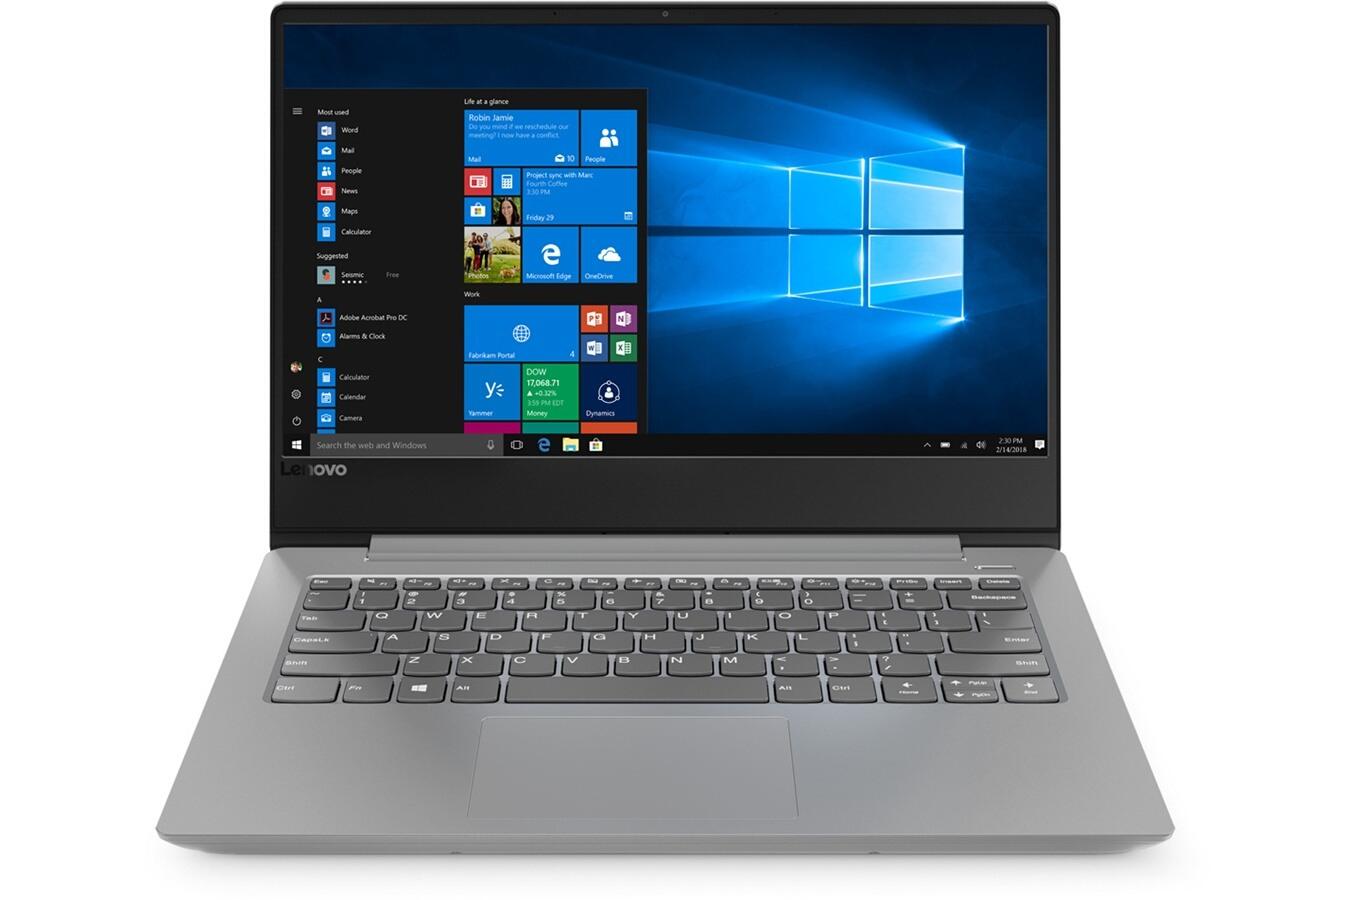 "PC Portable 14"" Lenovo Ideapad 330S (81F80027FR) - Full HD, A9-9425, 4 Go RAM (soudée + 1 slot libre), SSD 128 Go, Win 10S (+69.80€ en SP)"